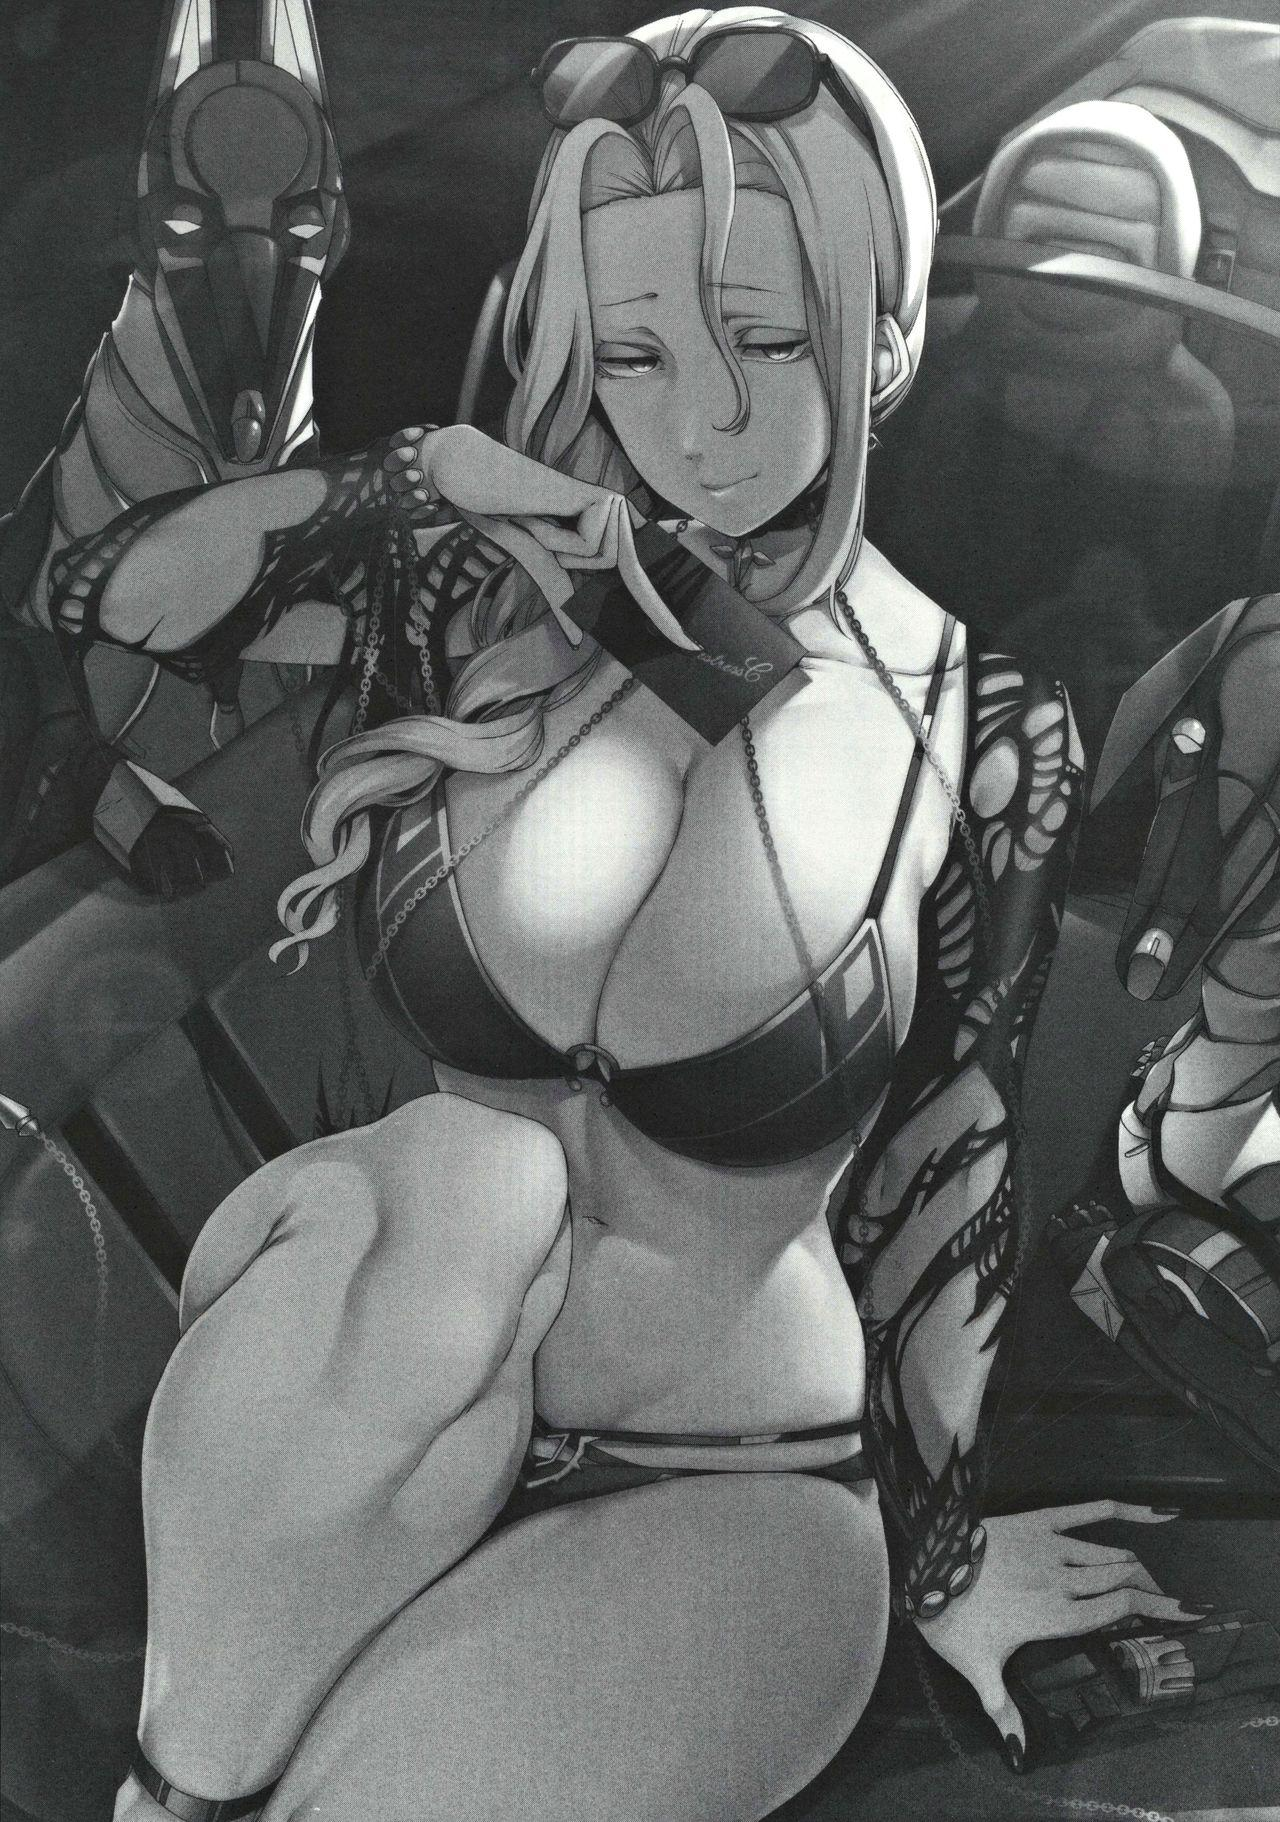 Carmilla-san no Ecchi na no ga Kakitakatta Hon 26